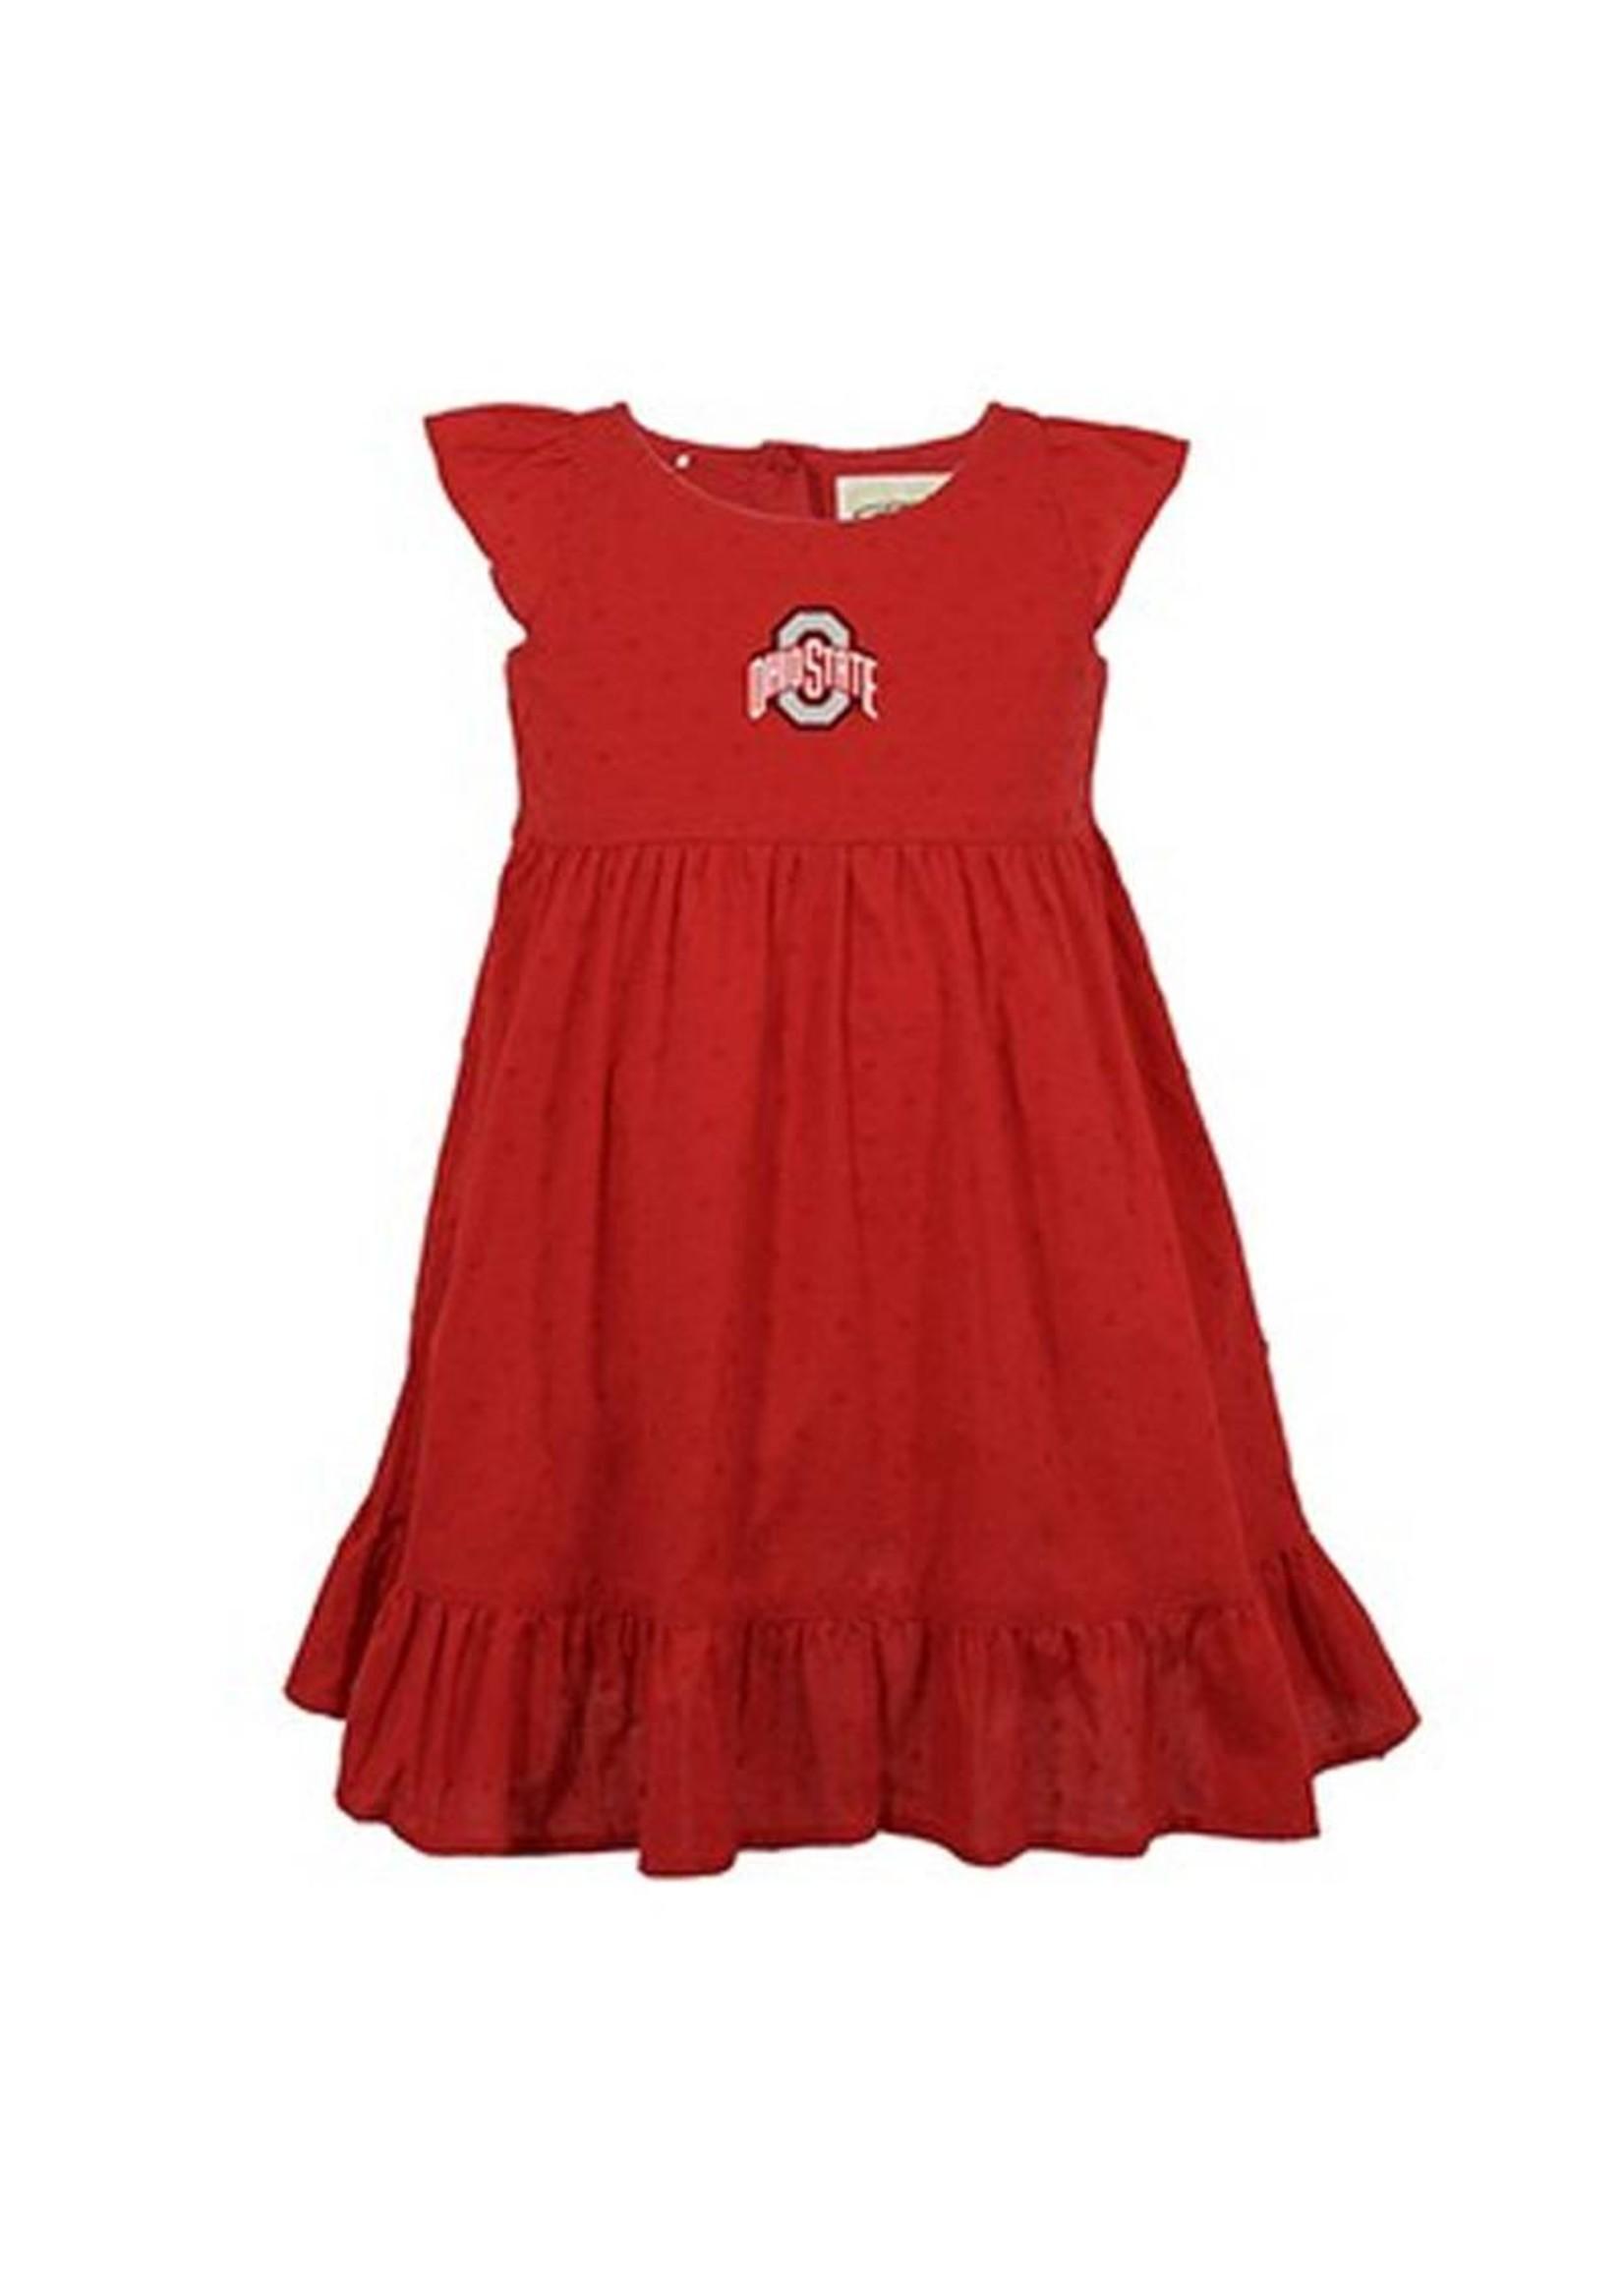 Ohio State University Scarlet Toddler Dress